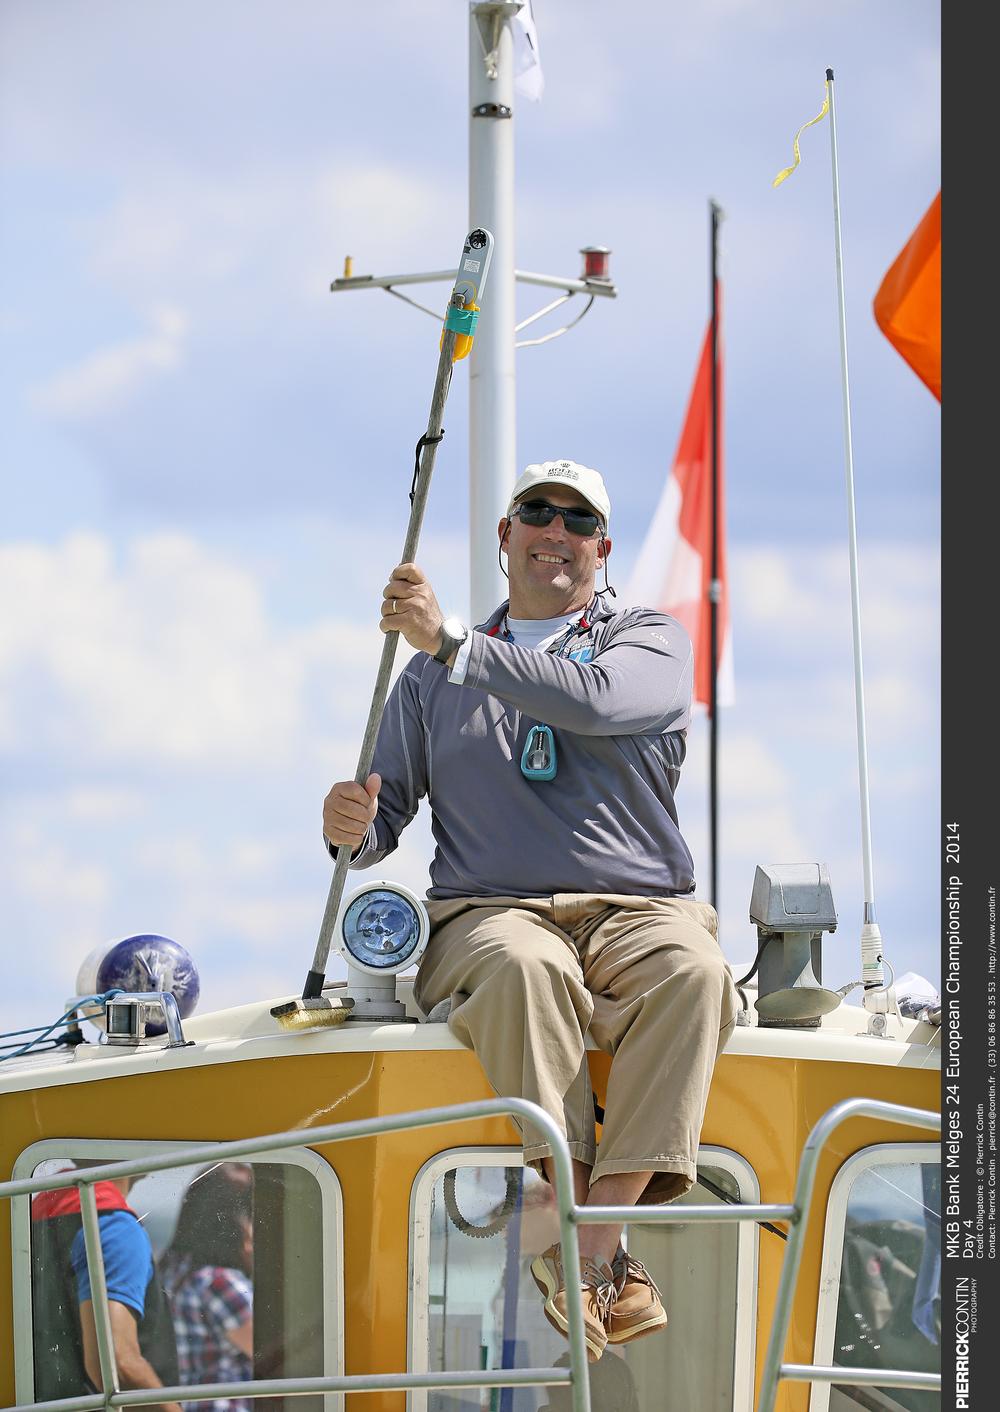 Hank Stuart at the 2014 Melges 24 European Championship in Hungary - photo Pierrick Contin